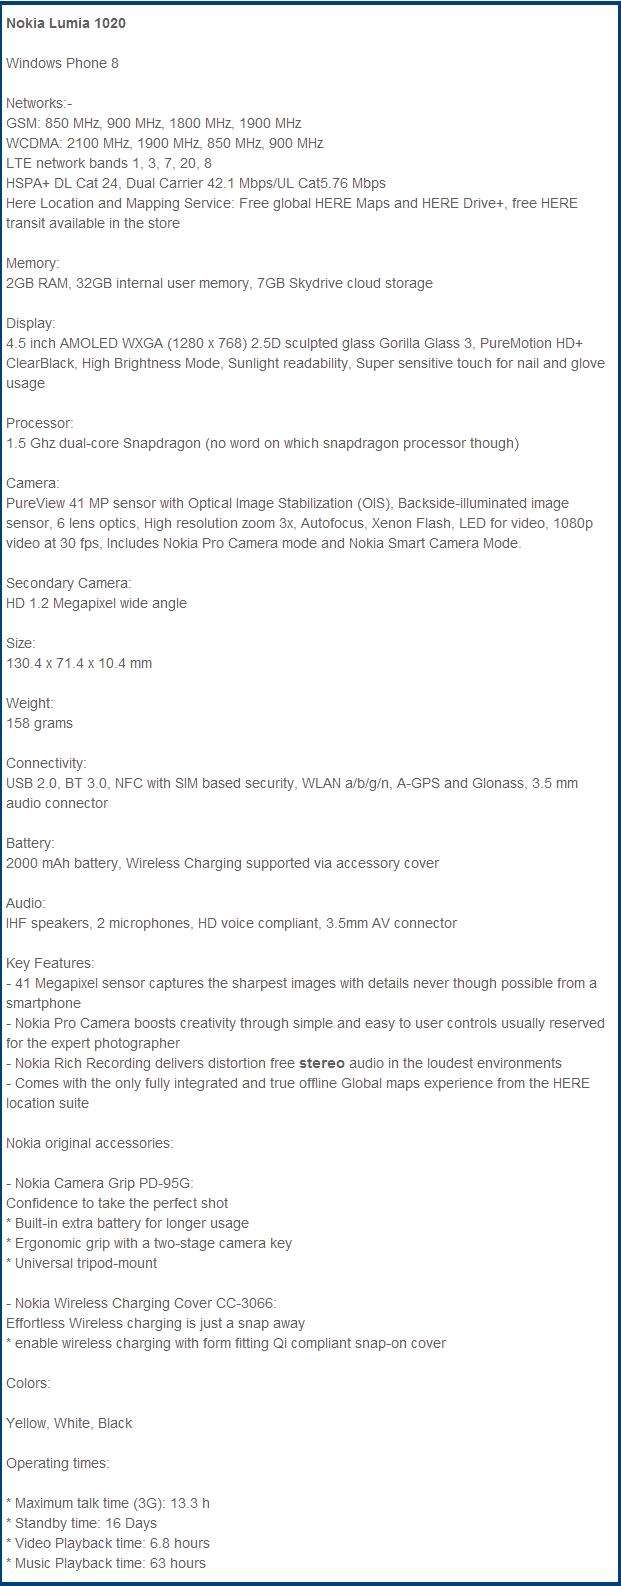 nokia-lumia-1020-especificaciones